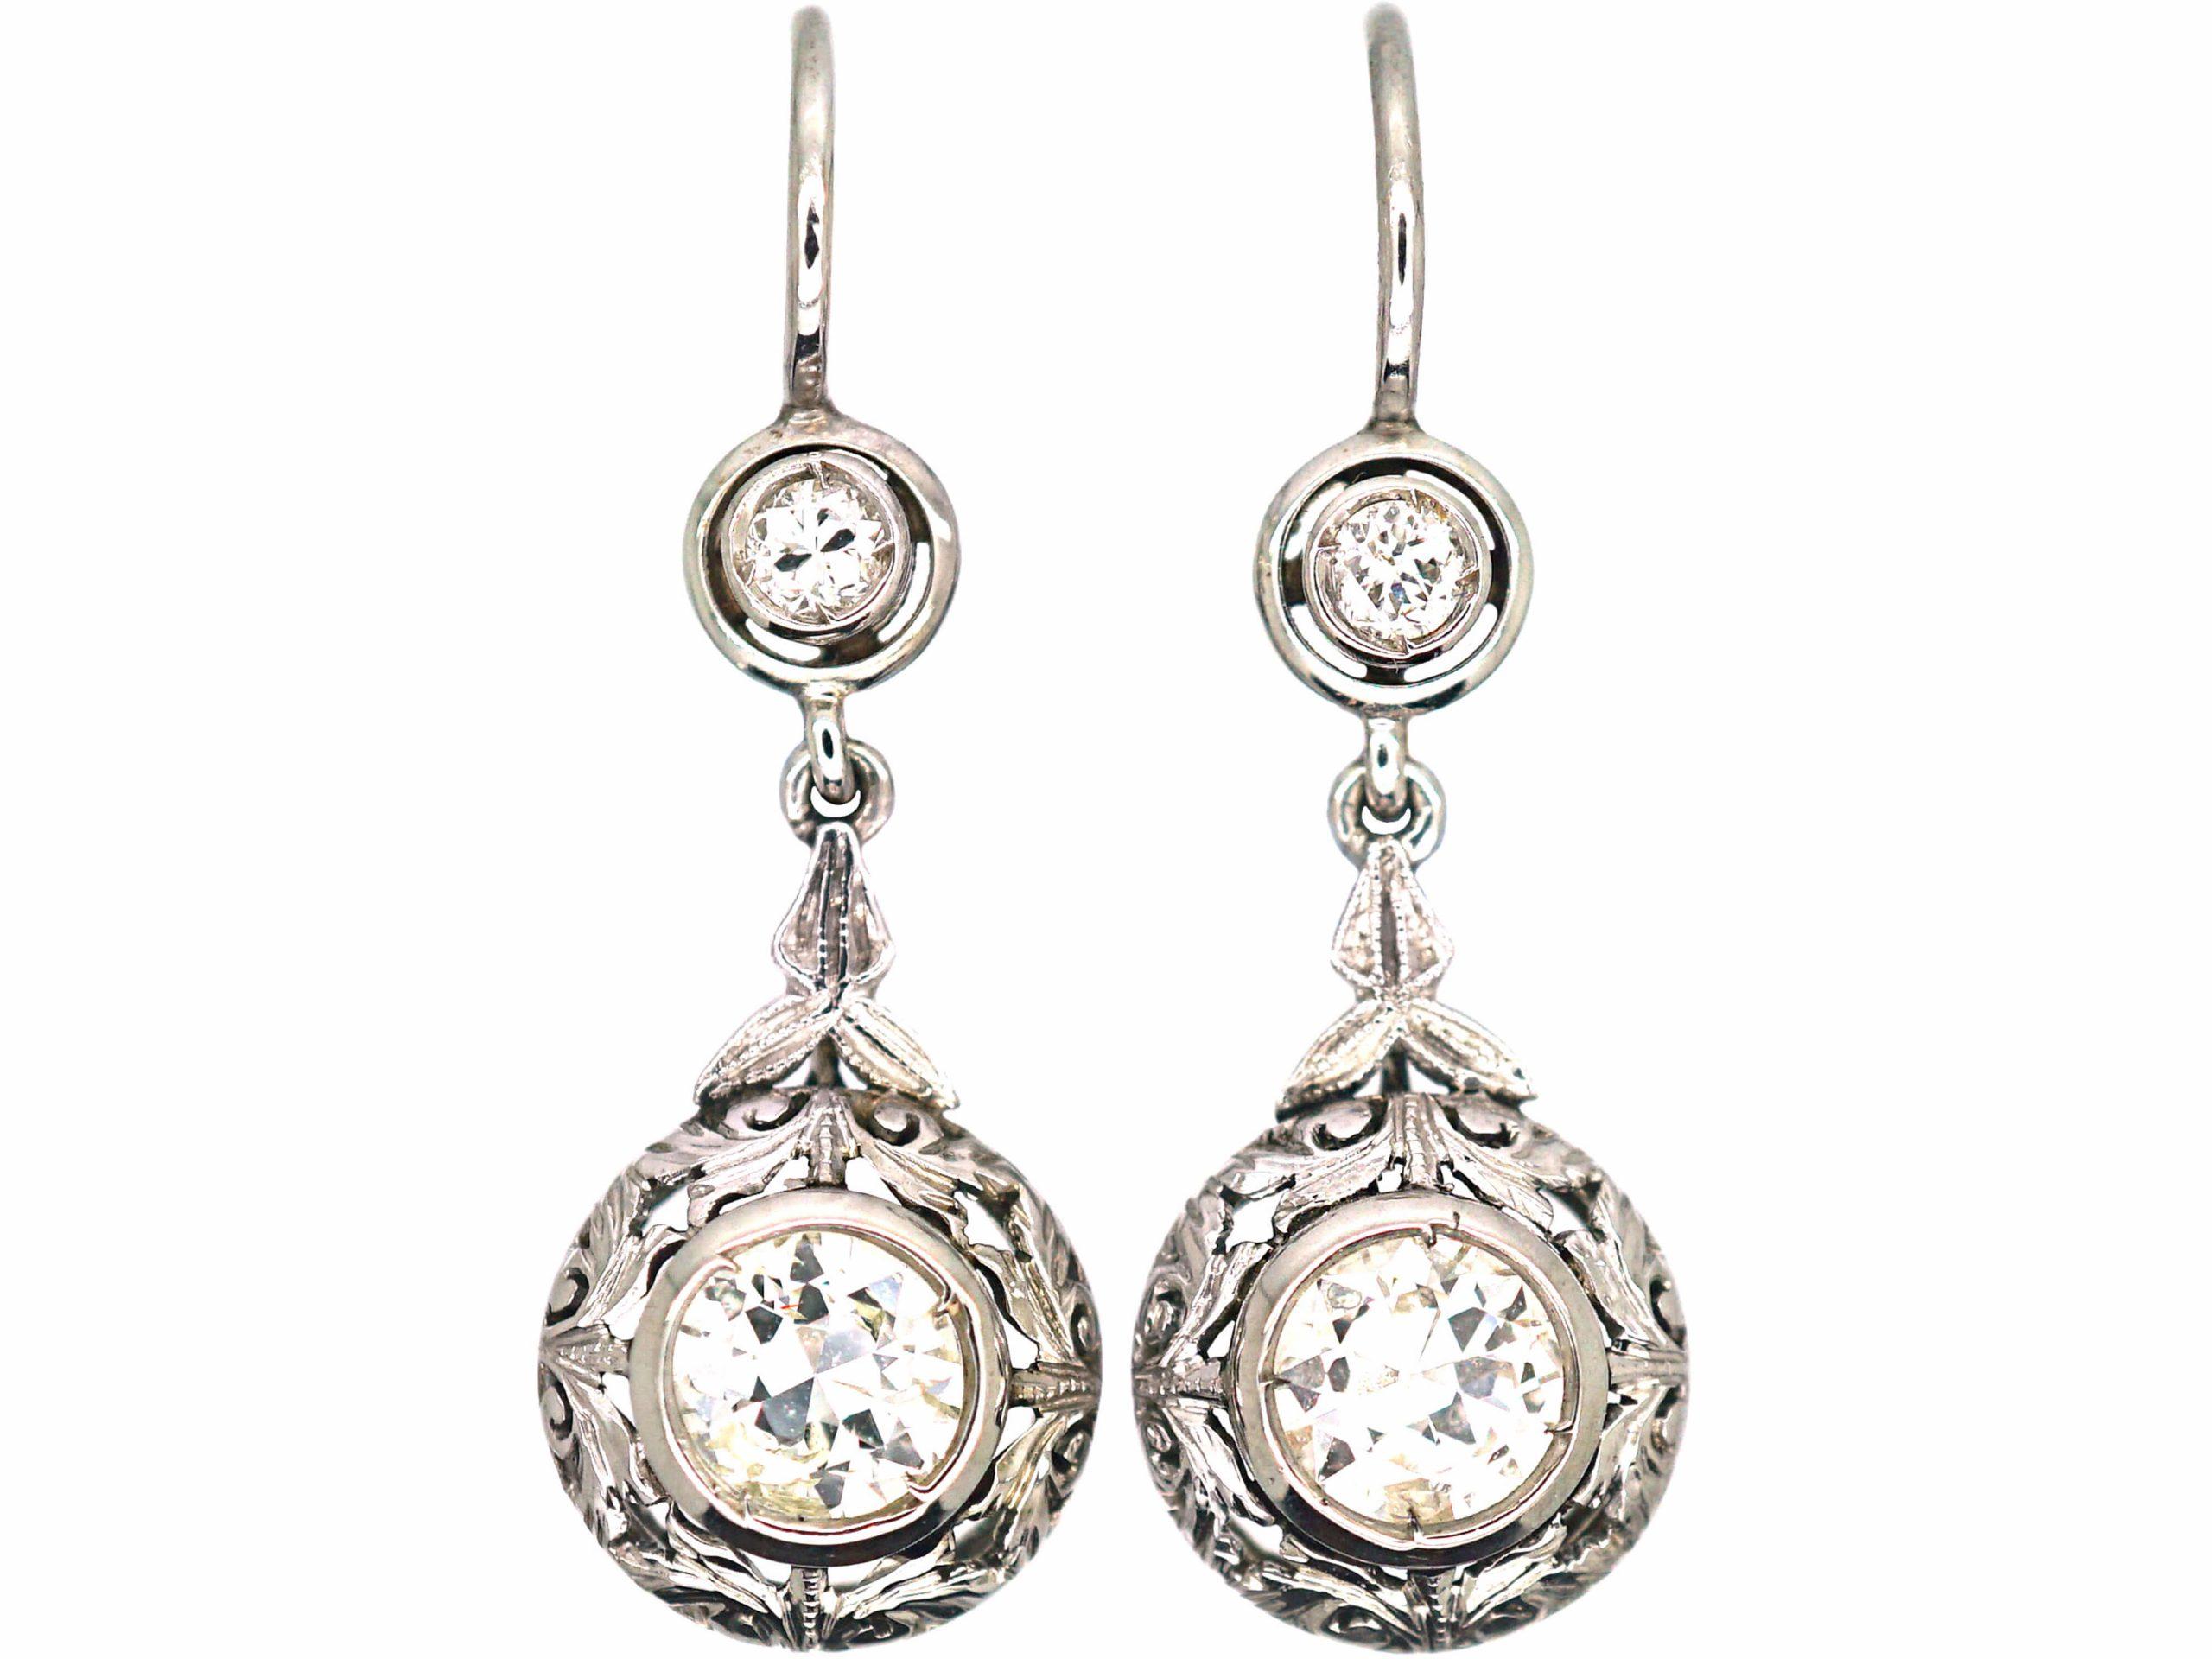 Art Deco 18ct White Gold & Diamond Drop Earrings